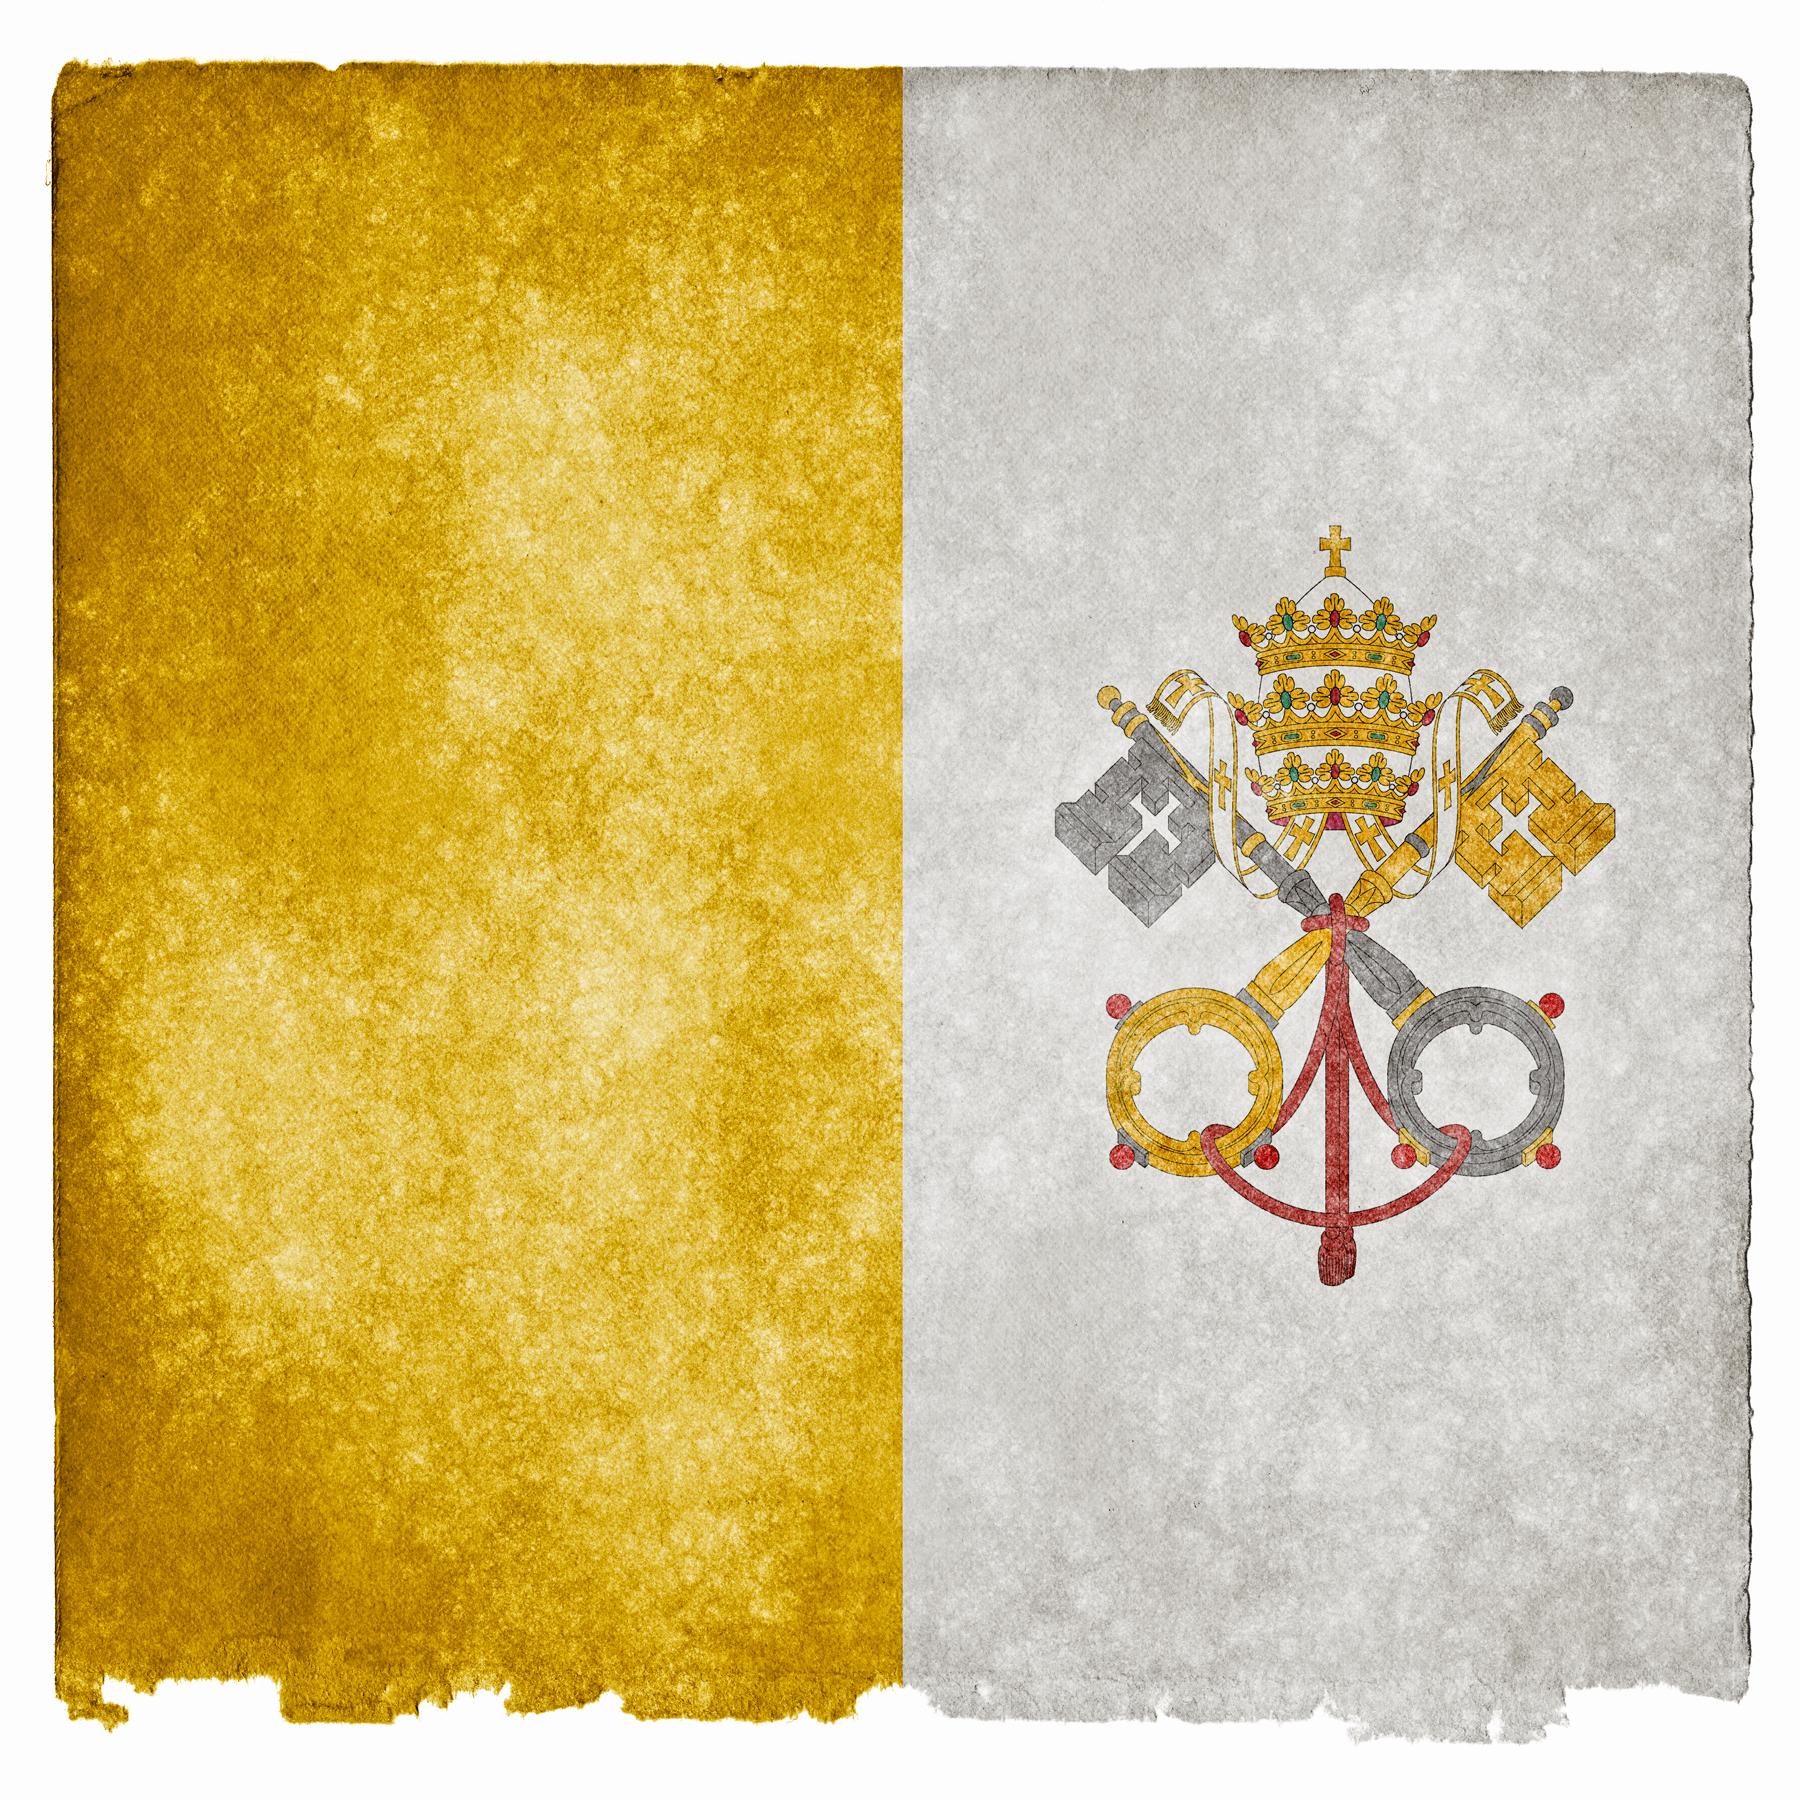 Vatican Grunge Flag, Aged, Sacred, National, Old, HQ Photo